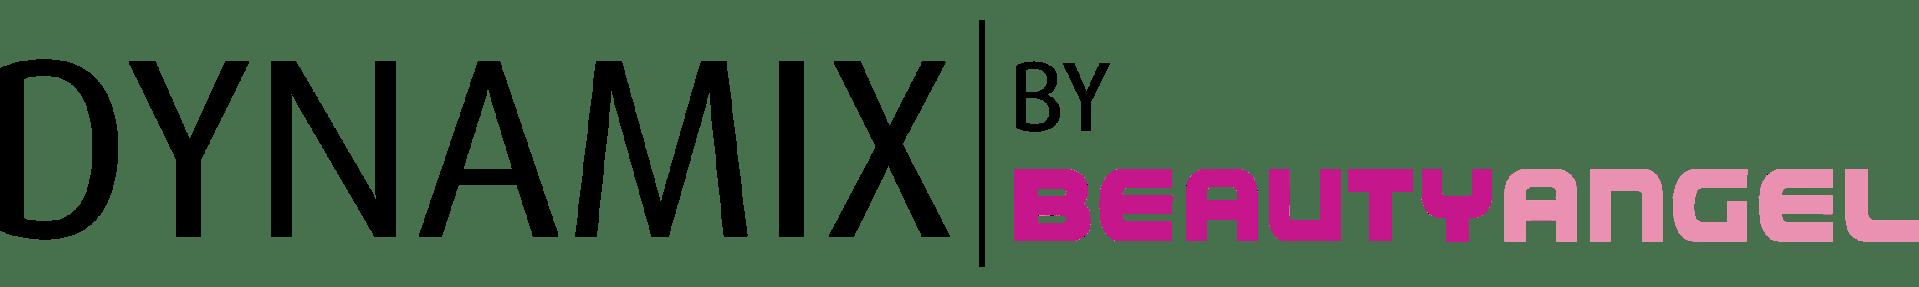 DYNAMIXbyBA_Logo_Line